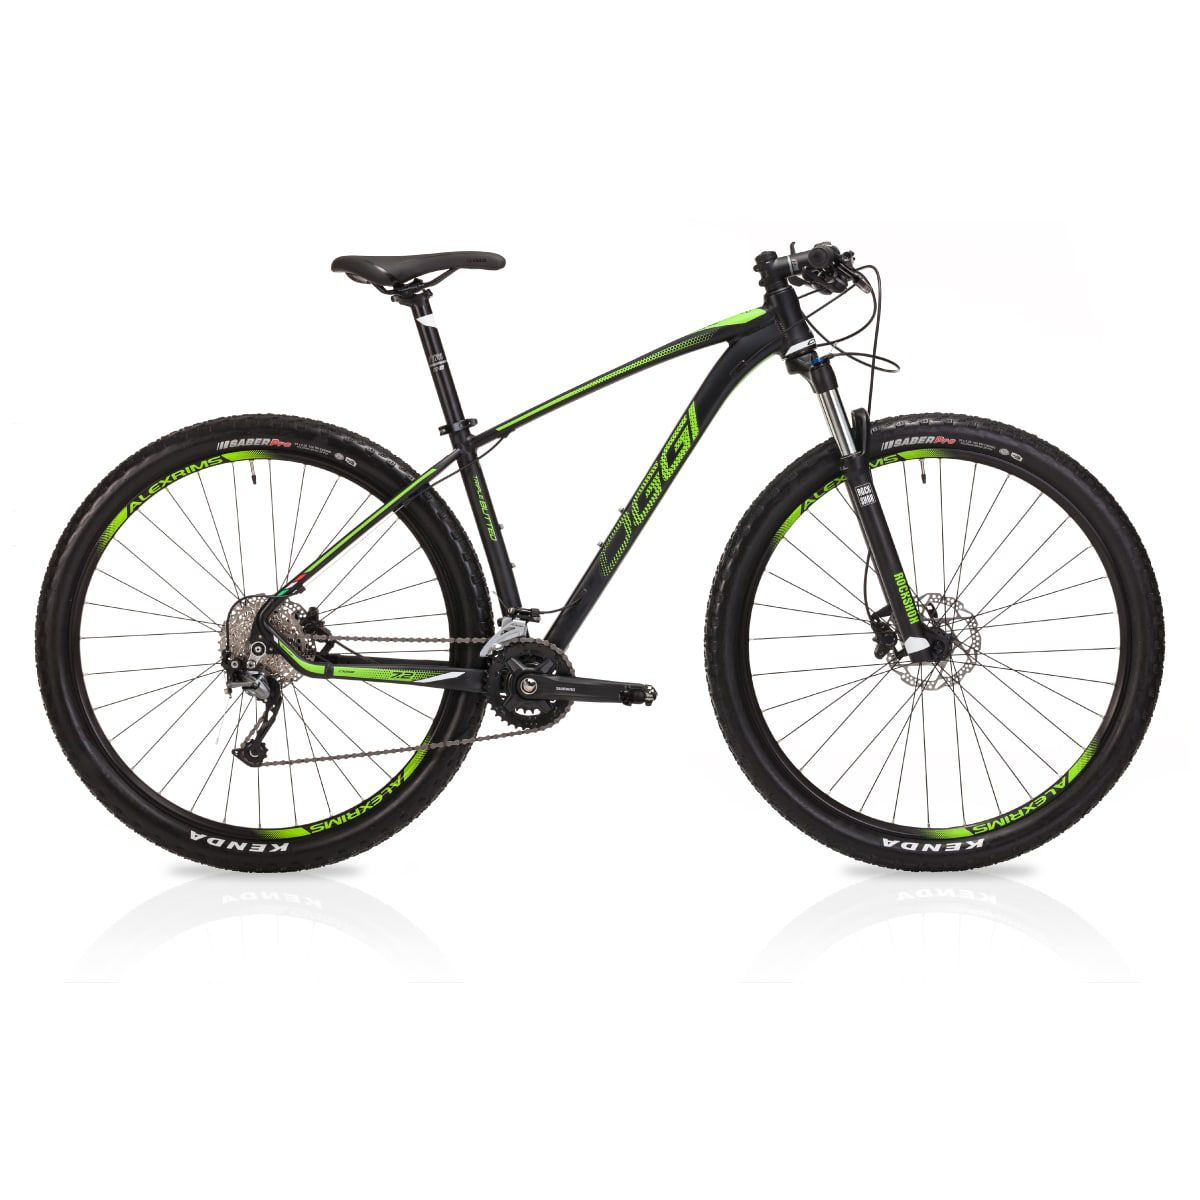 9a2666062 Bike Oggi Big Wheel 7.3 2019 Shimano Deore - Life Pedal ...